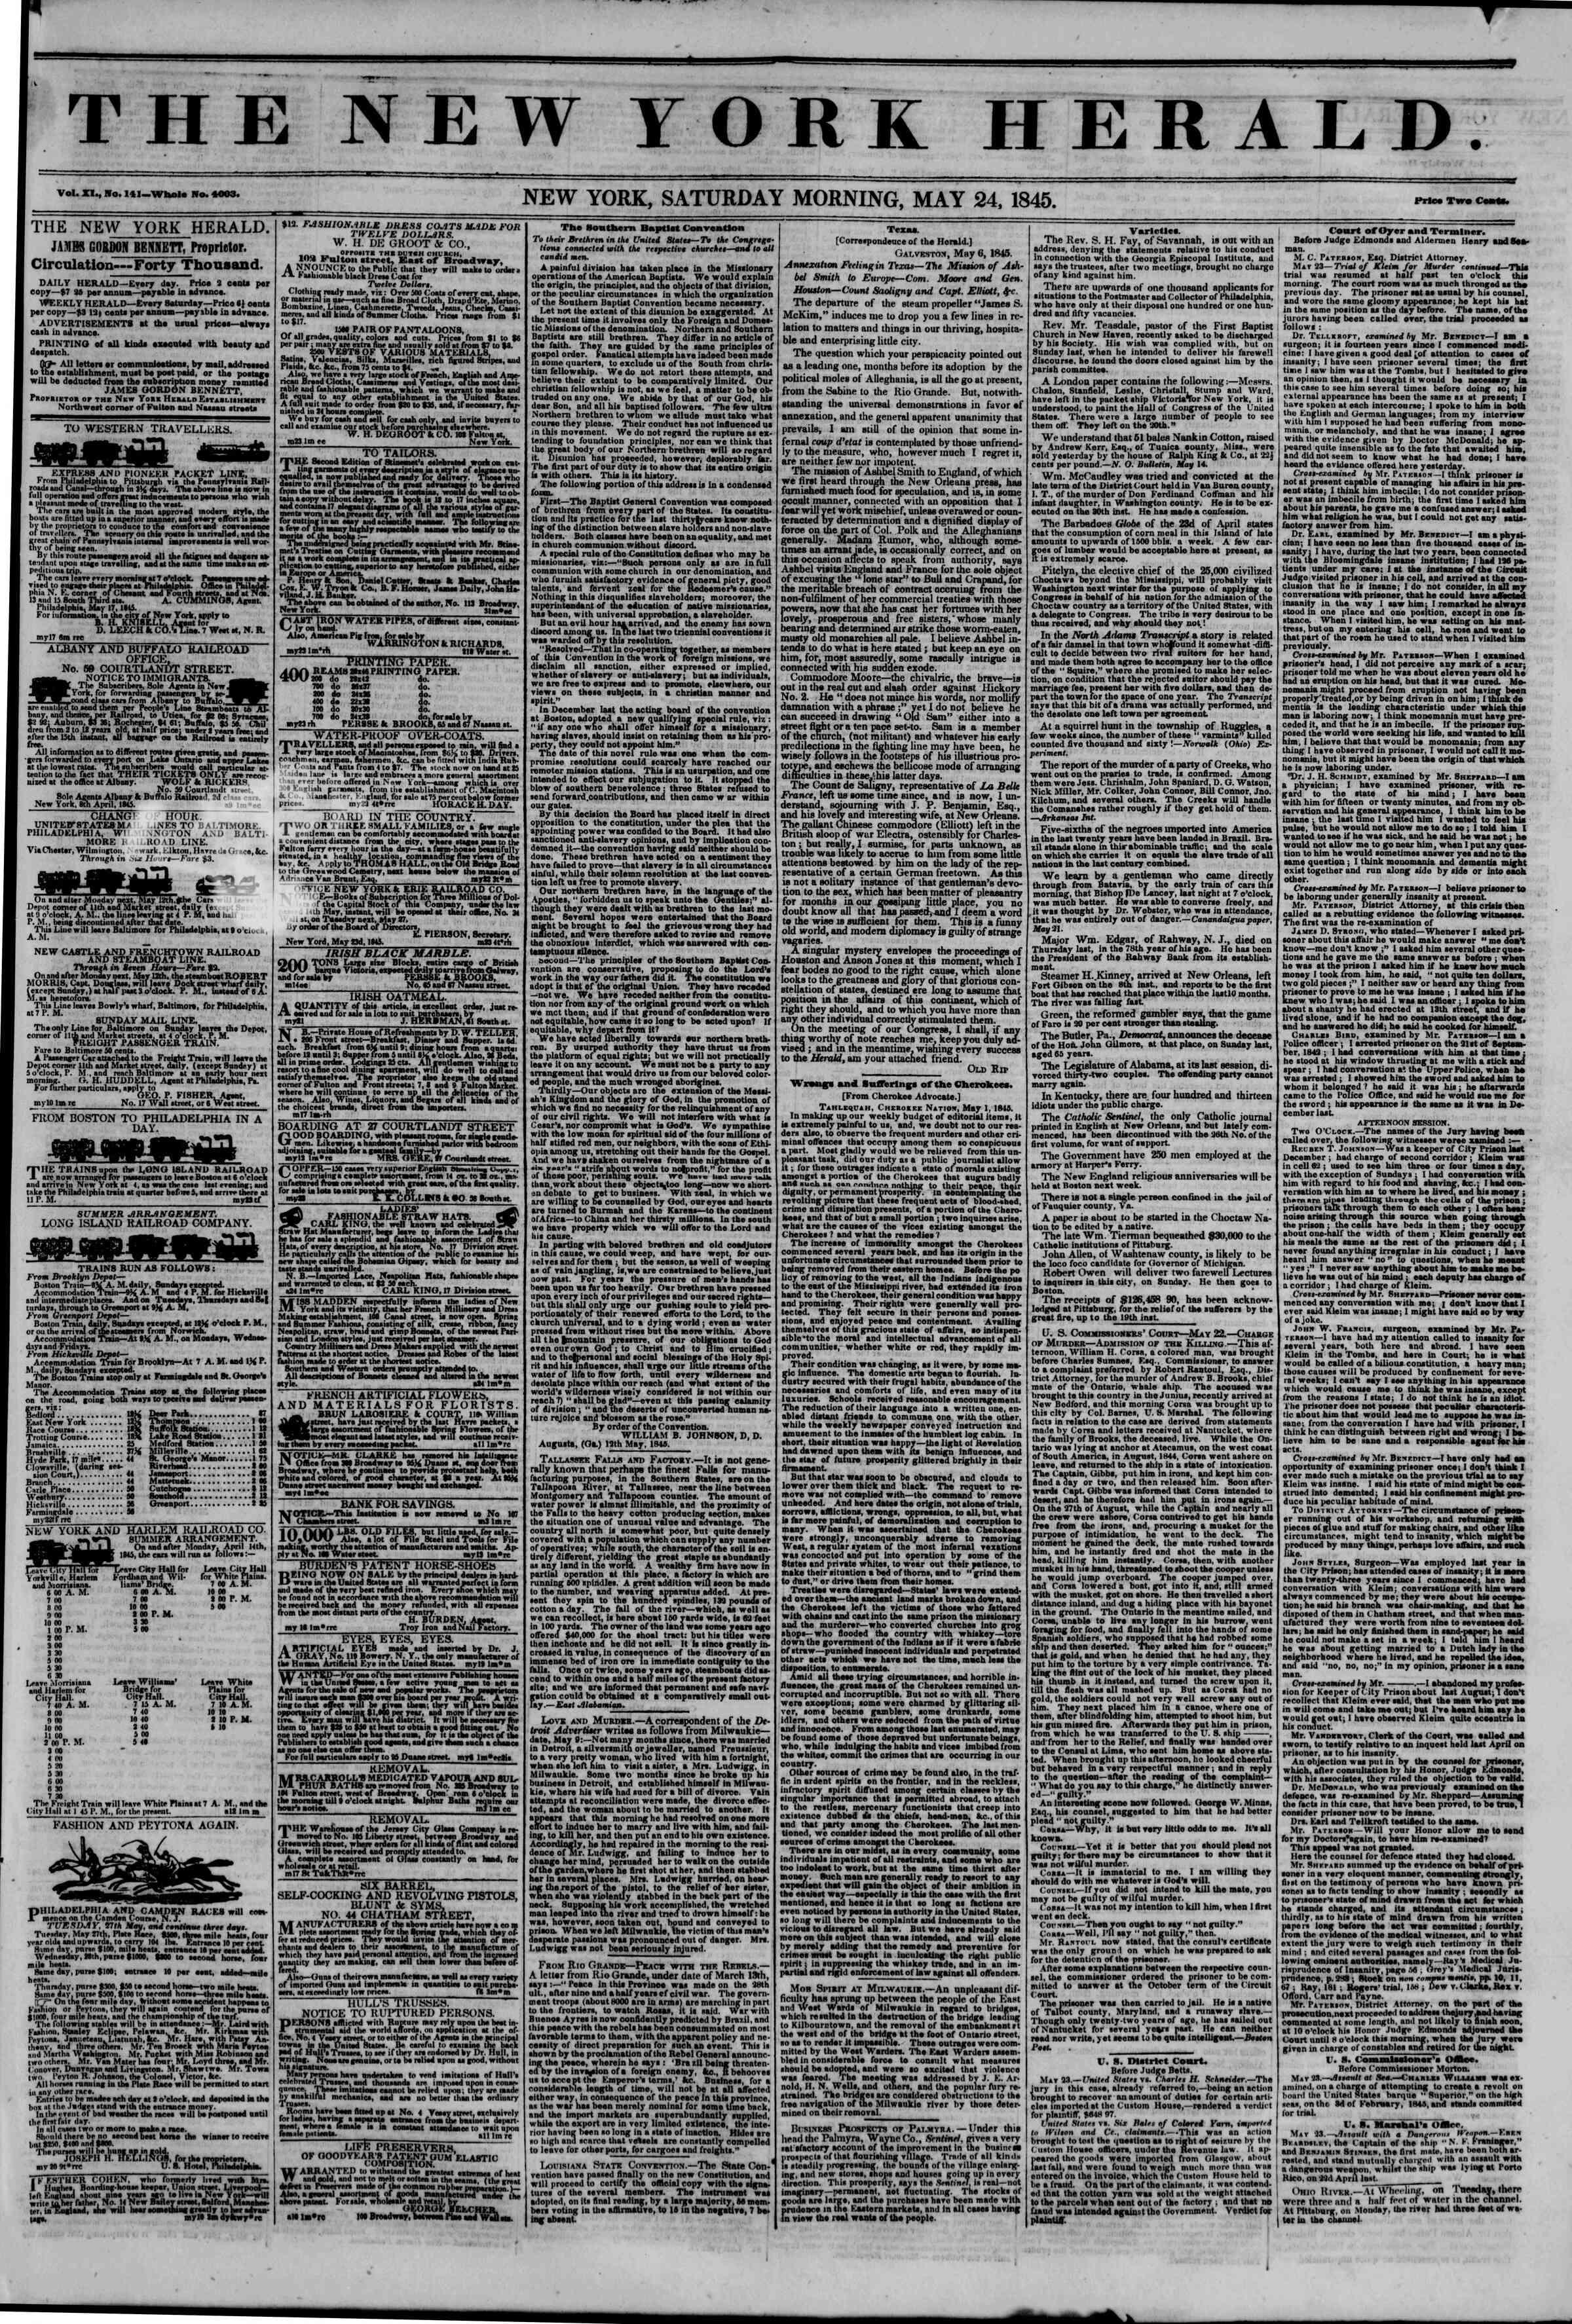 May 24, 1845 Tarihli The New York Herald Gazetesi Sayfa 1